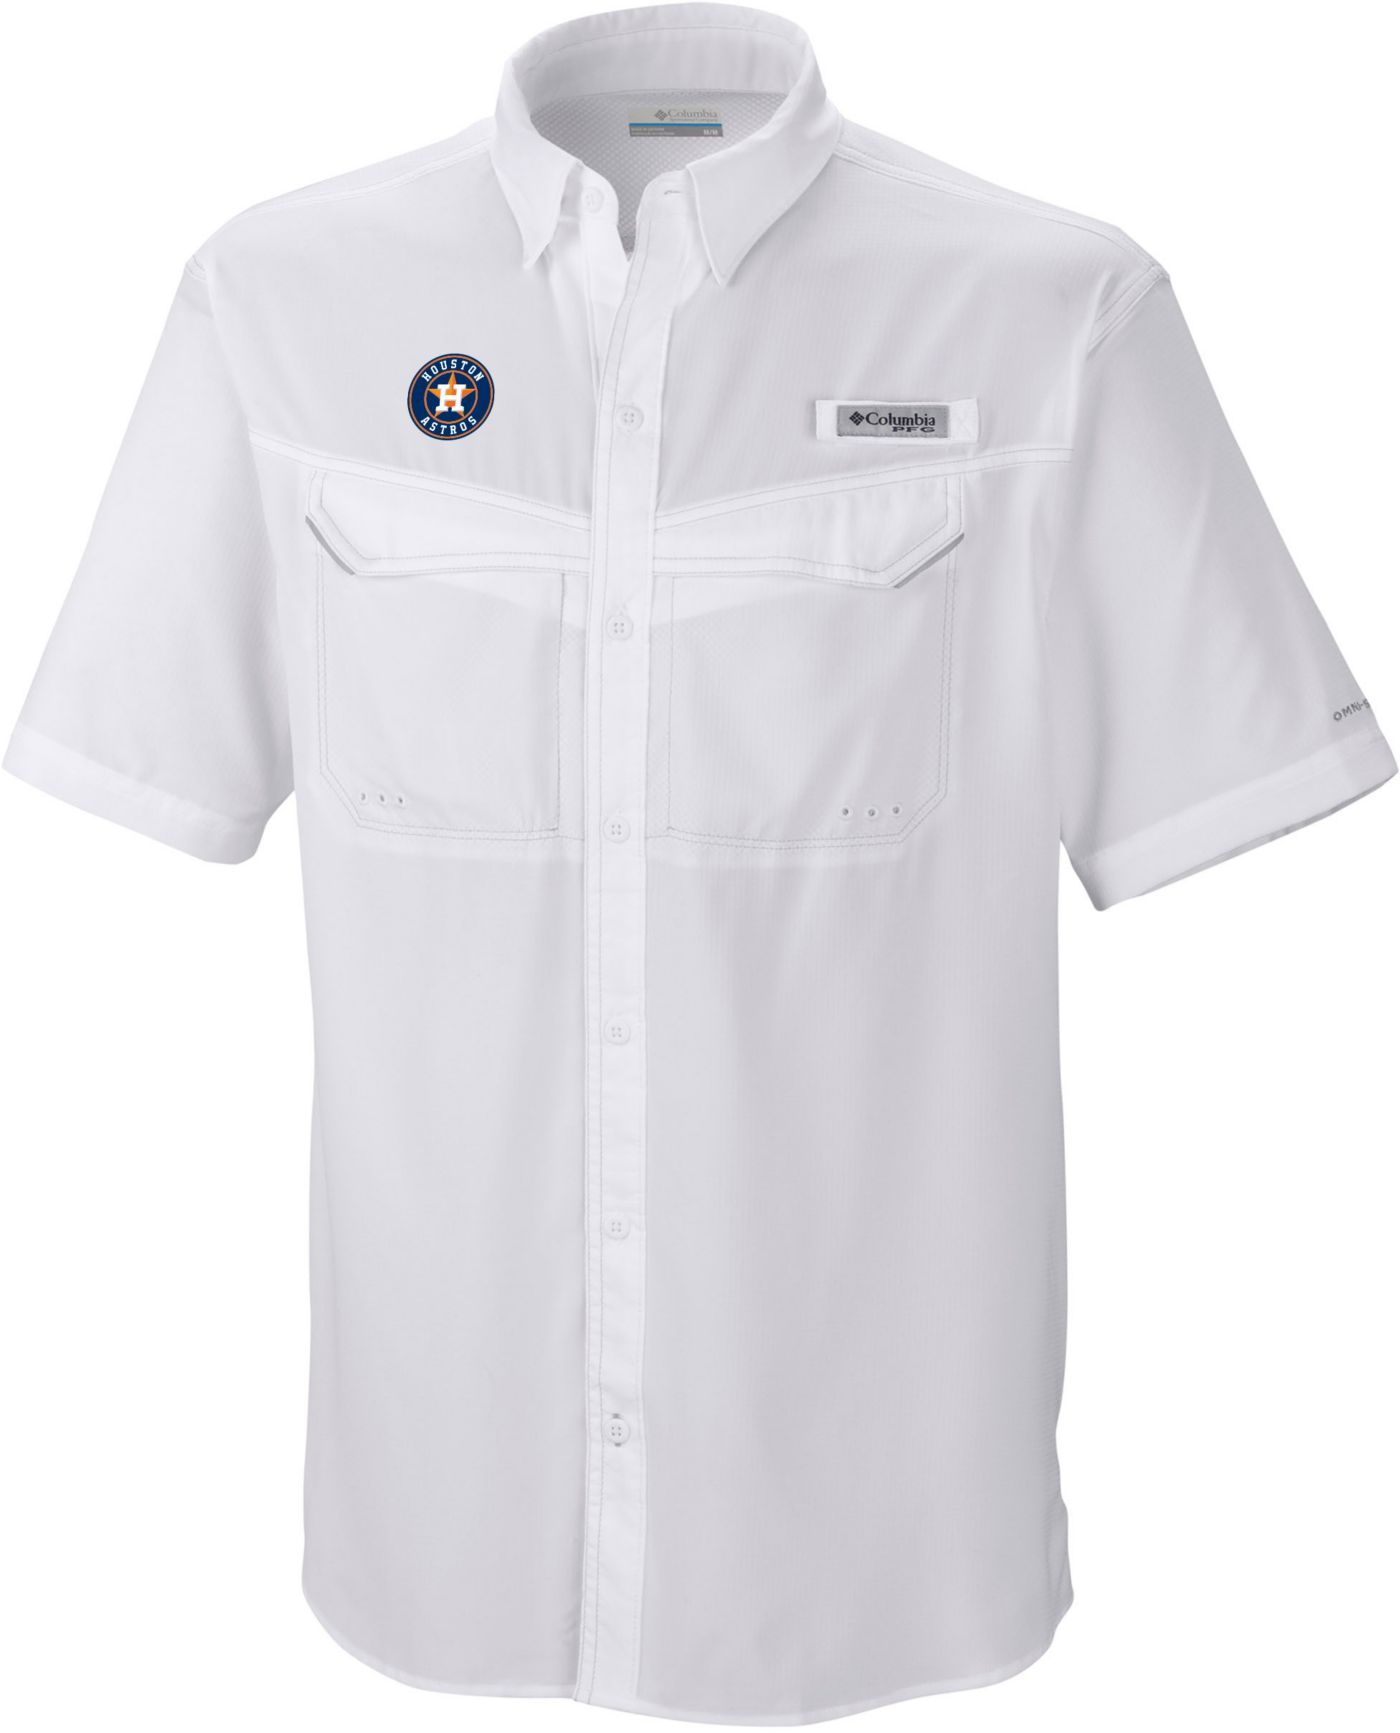 Columbia Men's Houston Astros Low Drag Offshore Performance Short Sleeve Shirt